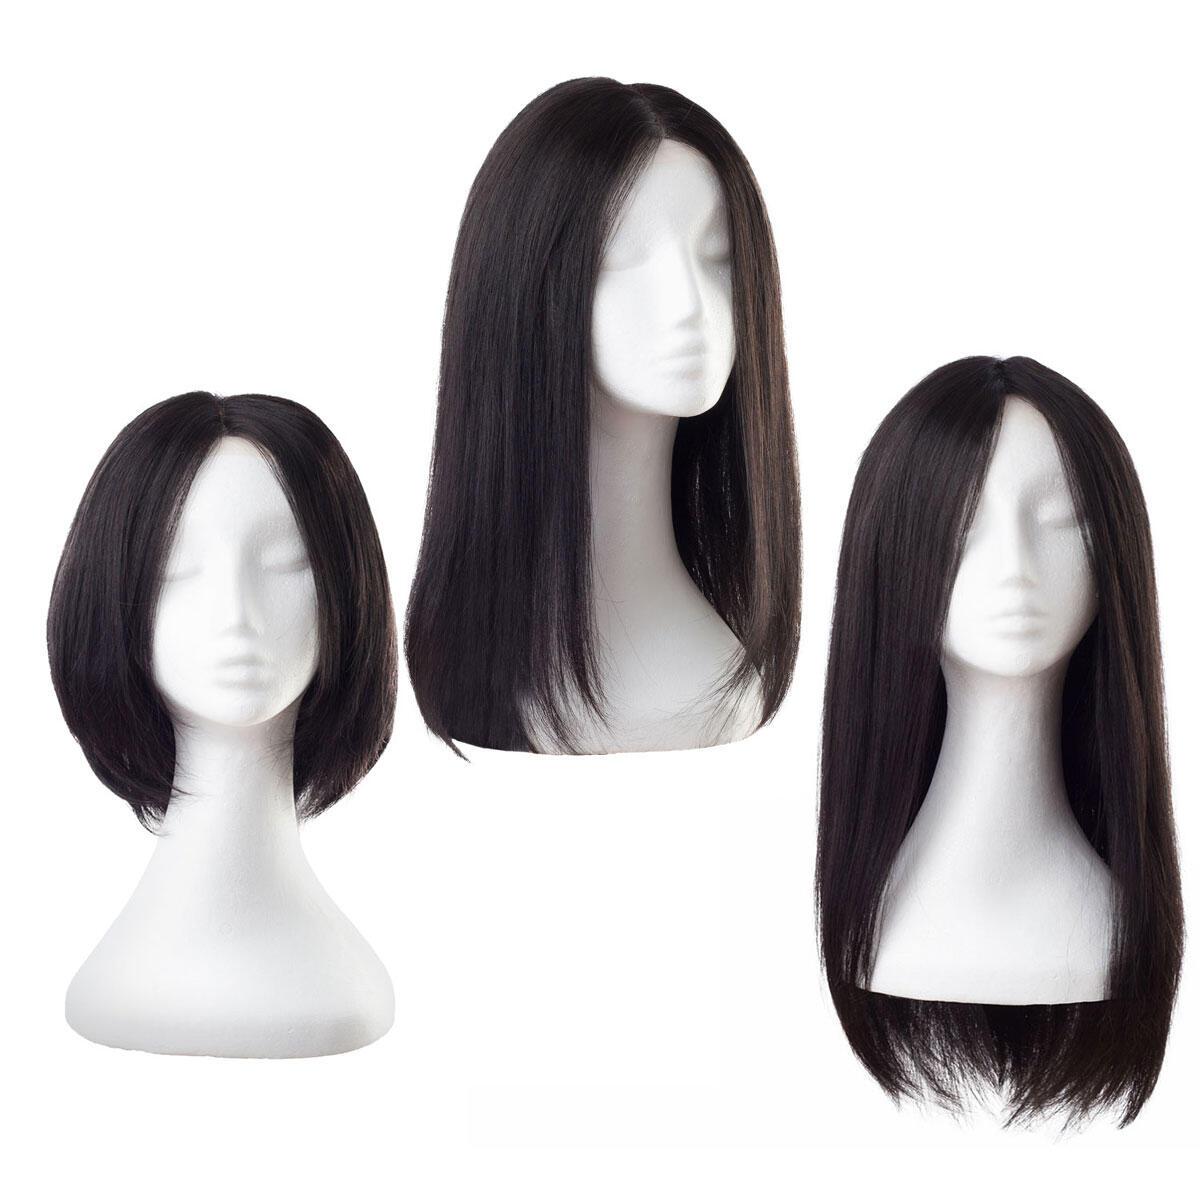 Lace Wig Human Hair 1.1 Intense Black 55 cm